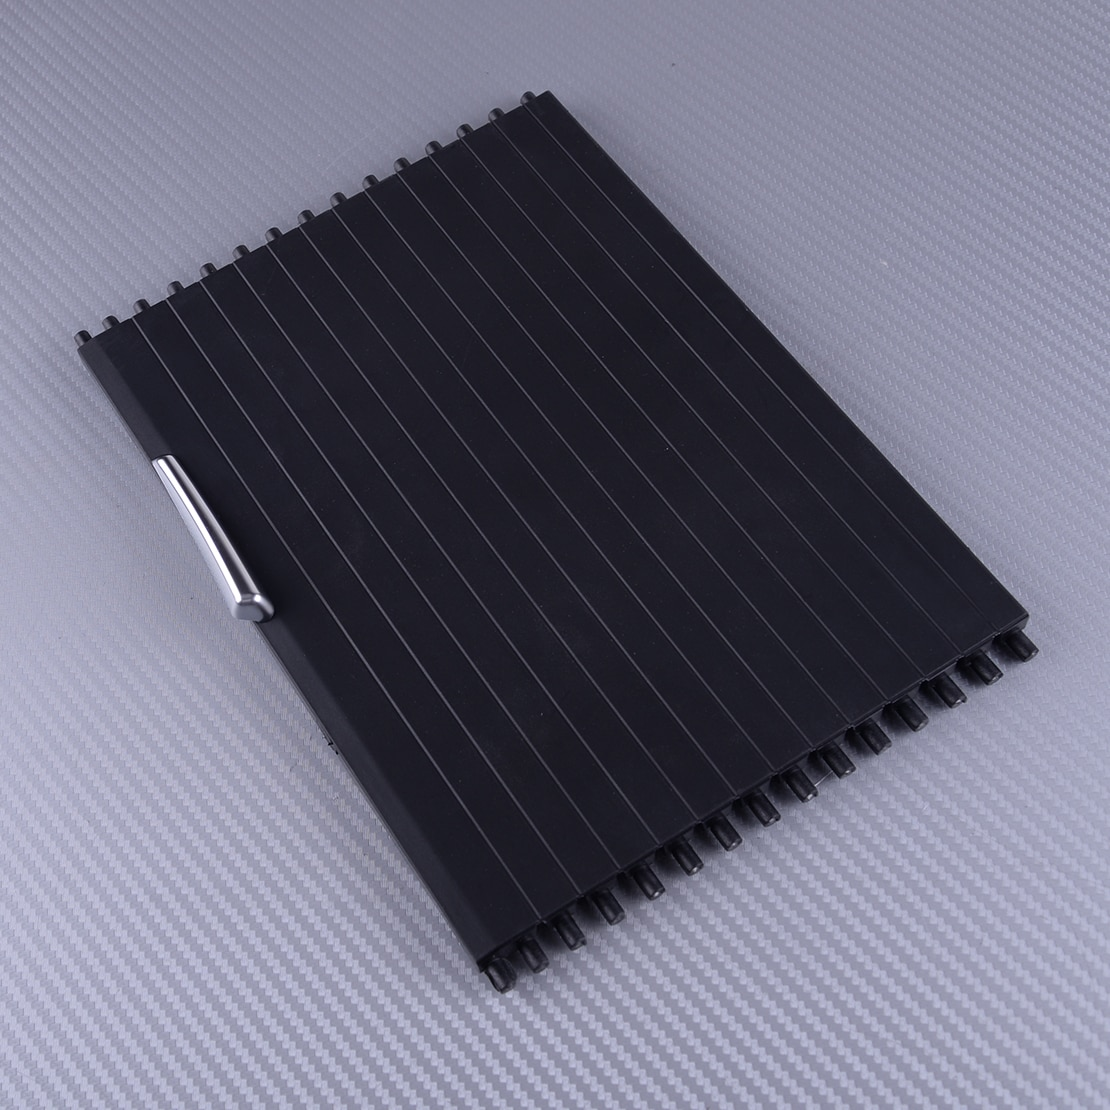 DWCX 1pc Rear Center Console Roller Blind Cover 51166954943 fit for BMW X5 X6 E70 E71 2007 2008 2009 2010 2011 2012 2013 2014